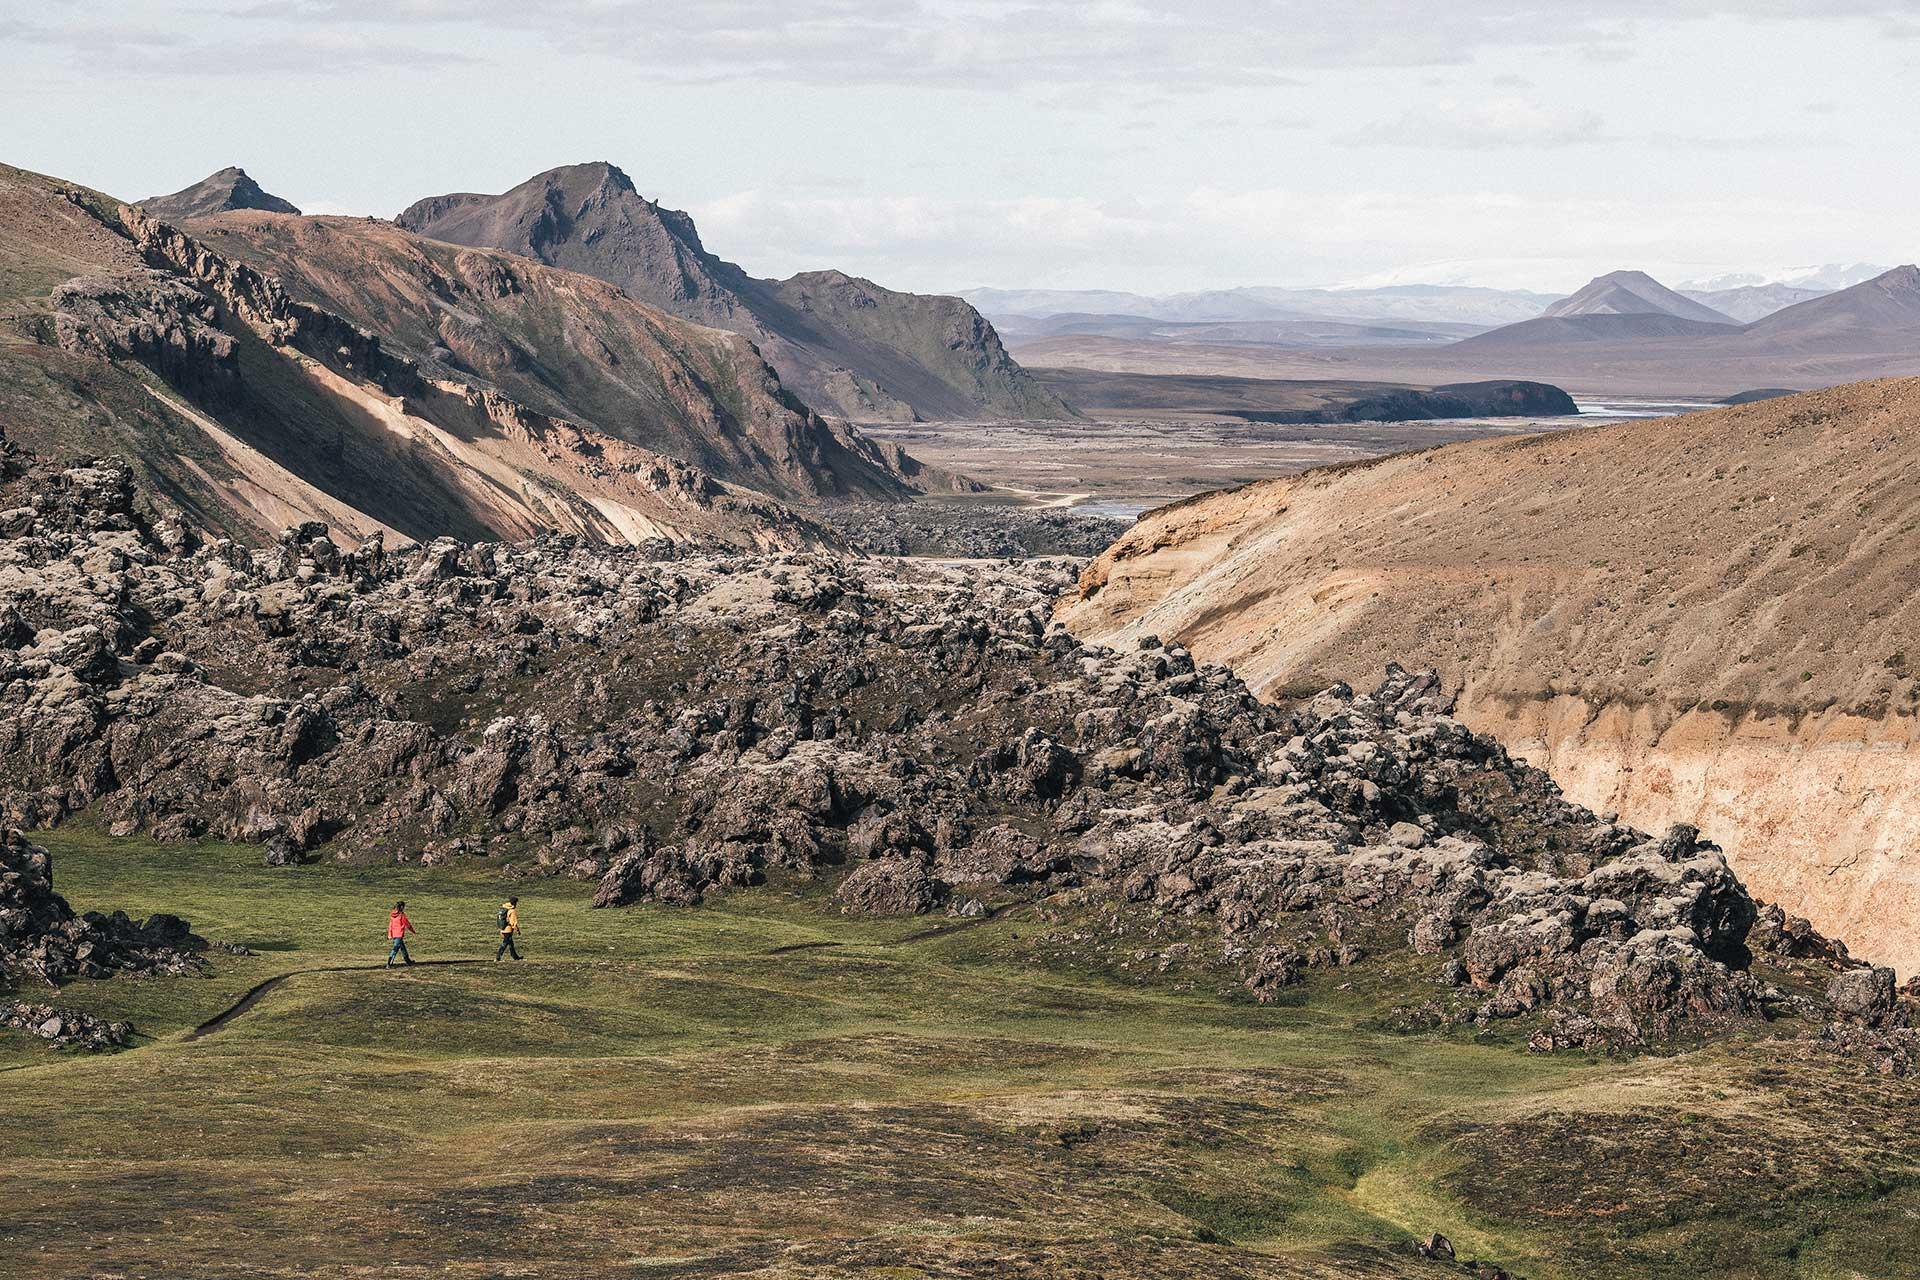 Landschaft Natur Outdoor Panorama Fotograf Island Michael Müller Fotoproduktion